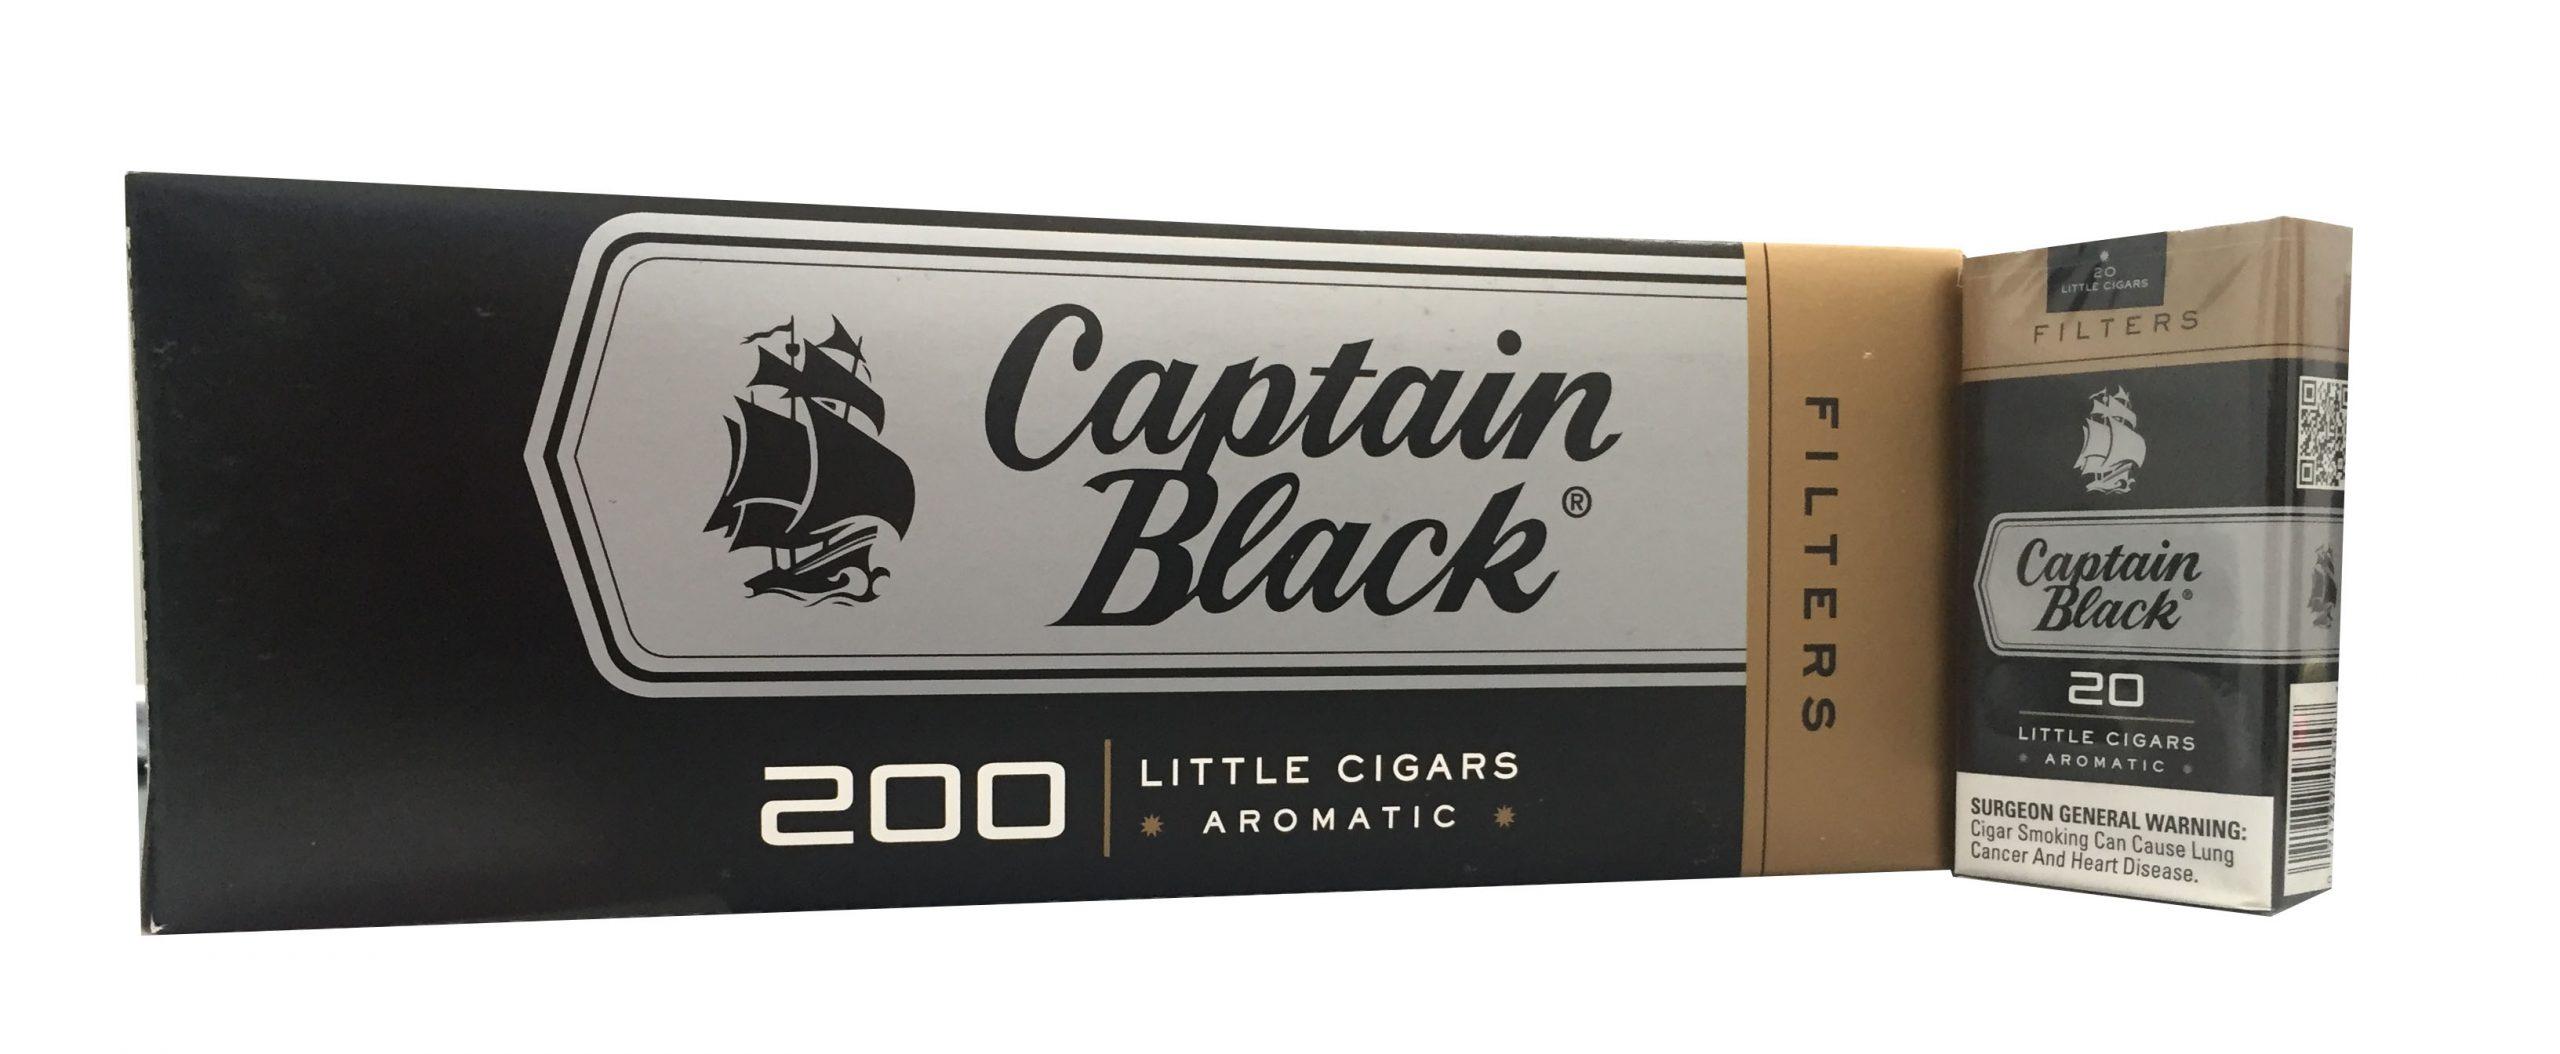 Captain Black Little Cigars Filters